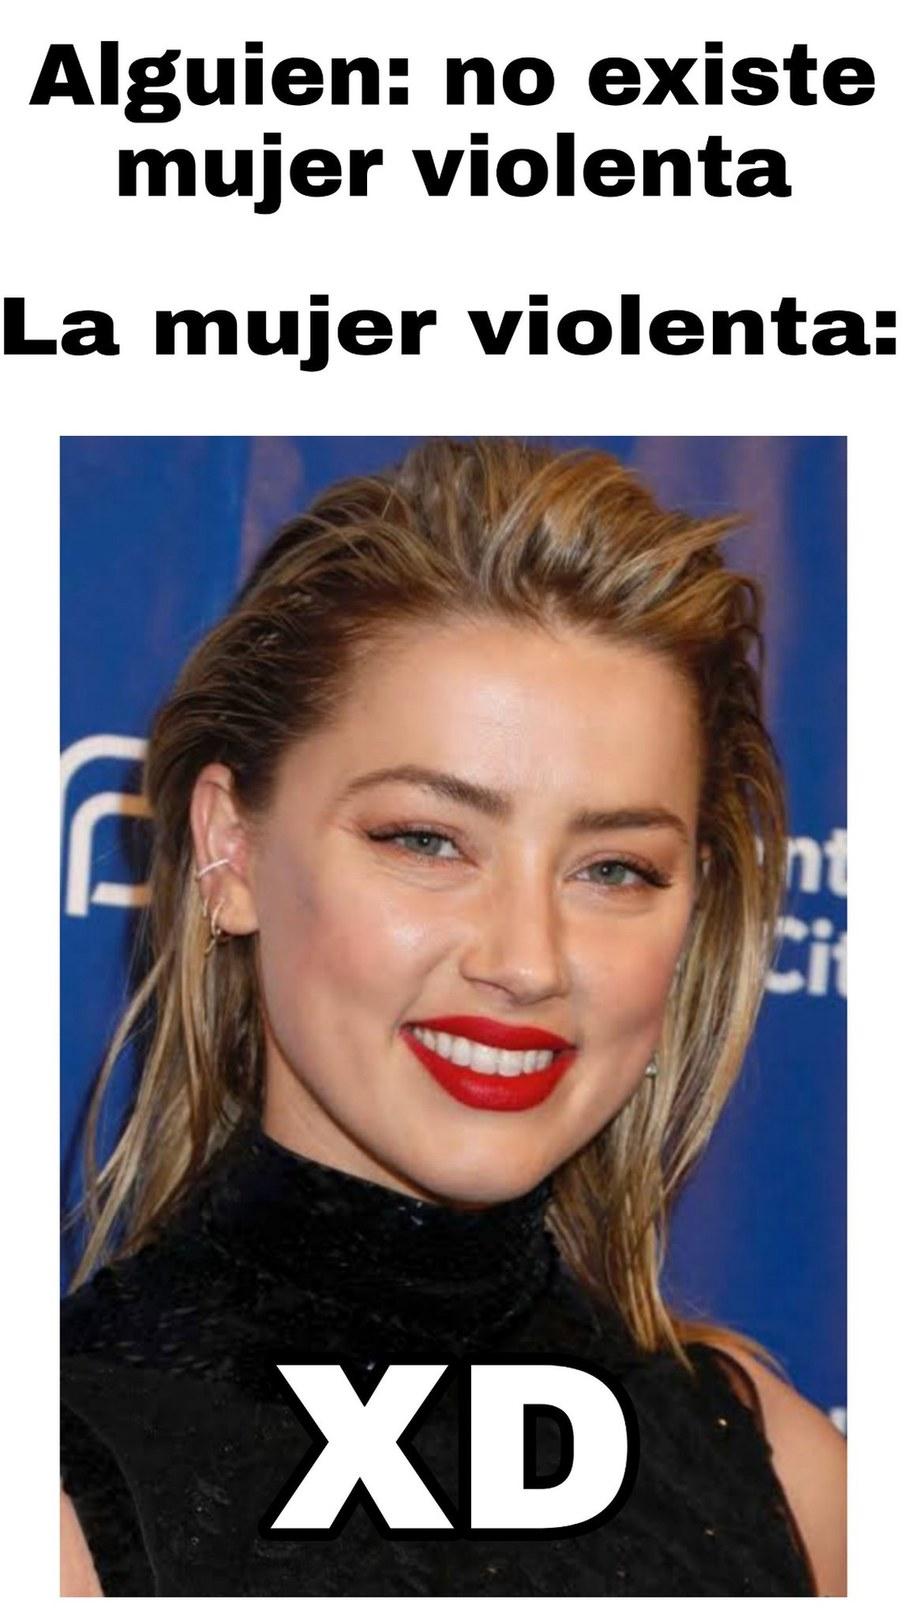 Para el que pide contexto, es la esposa de Jhonny Depp. - meme